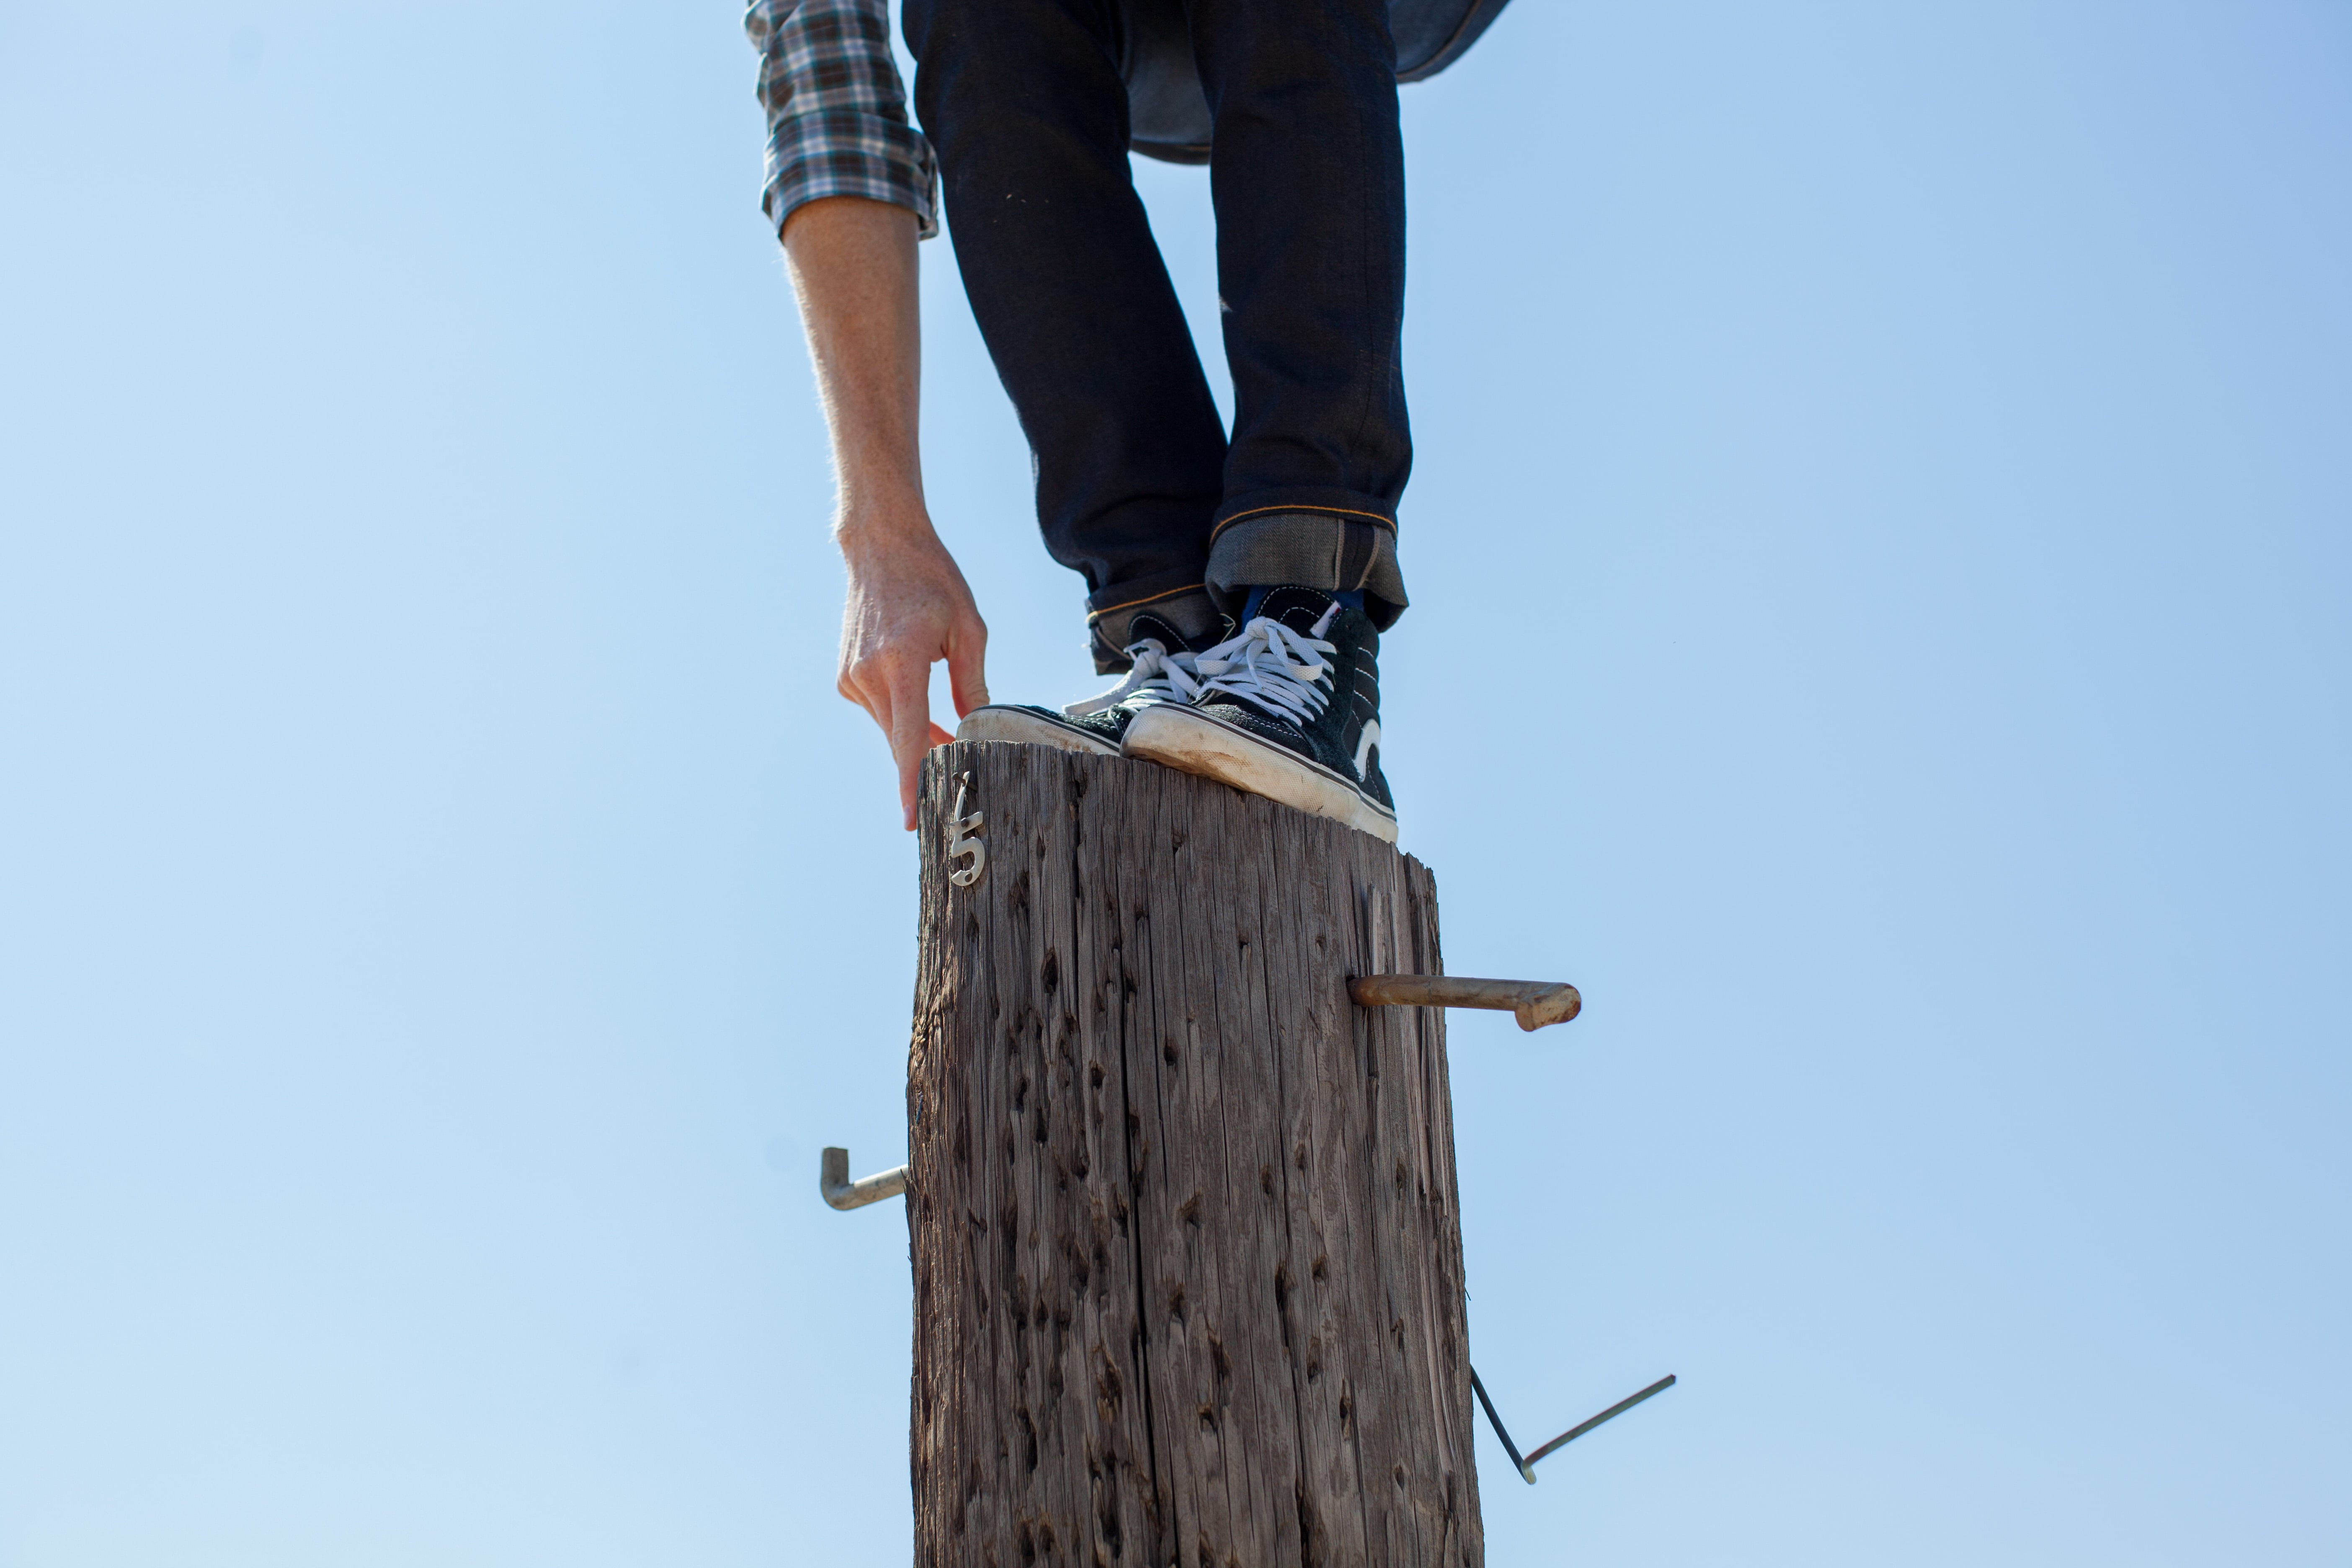 Man standing on high pole